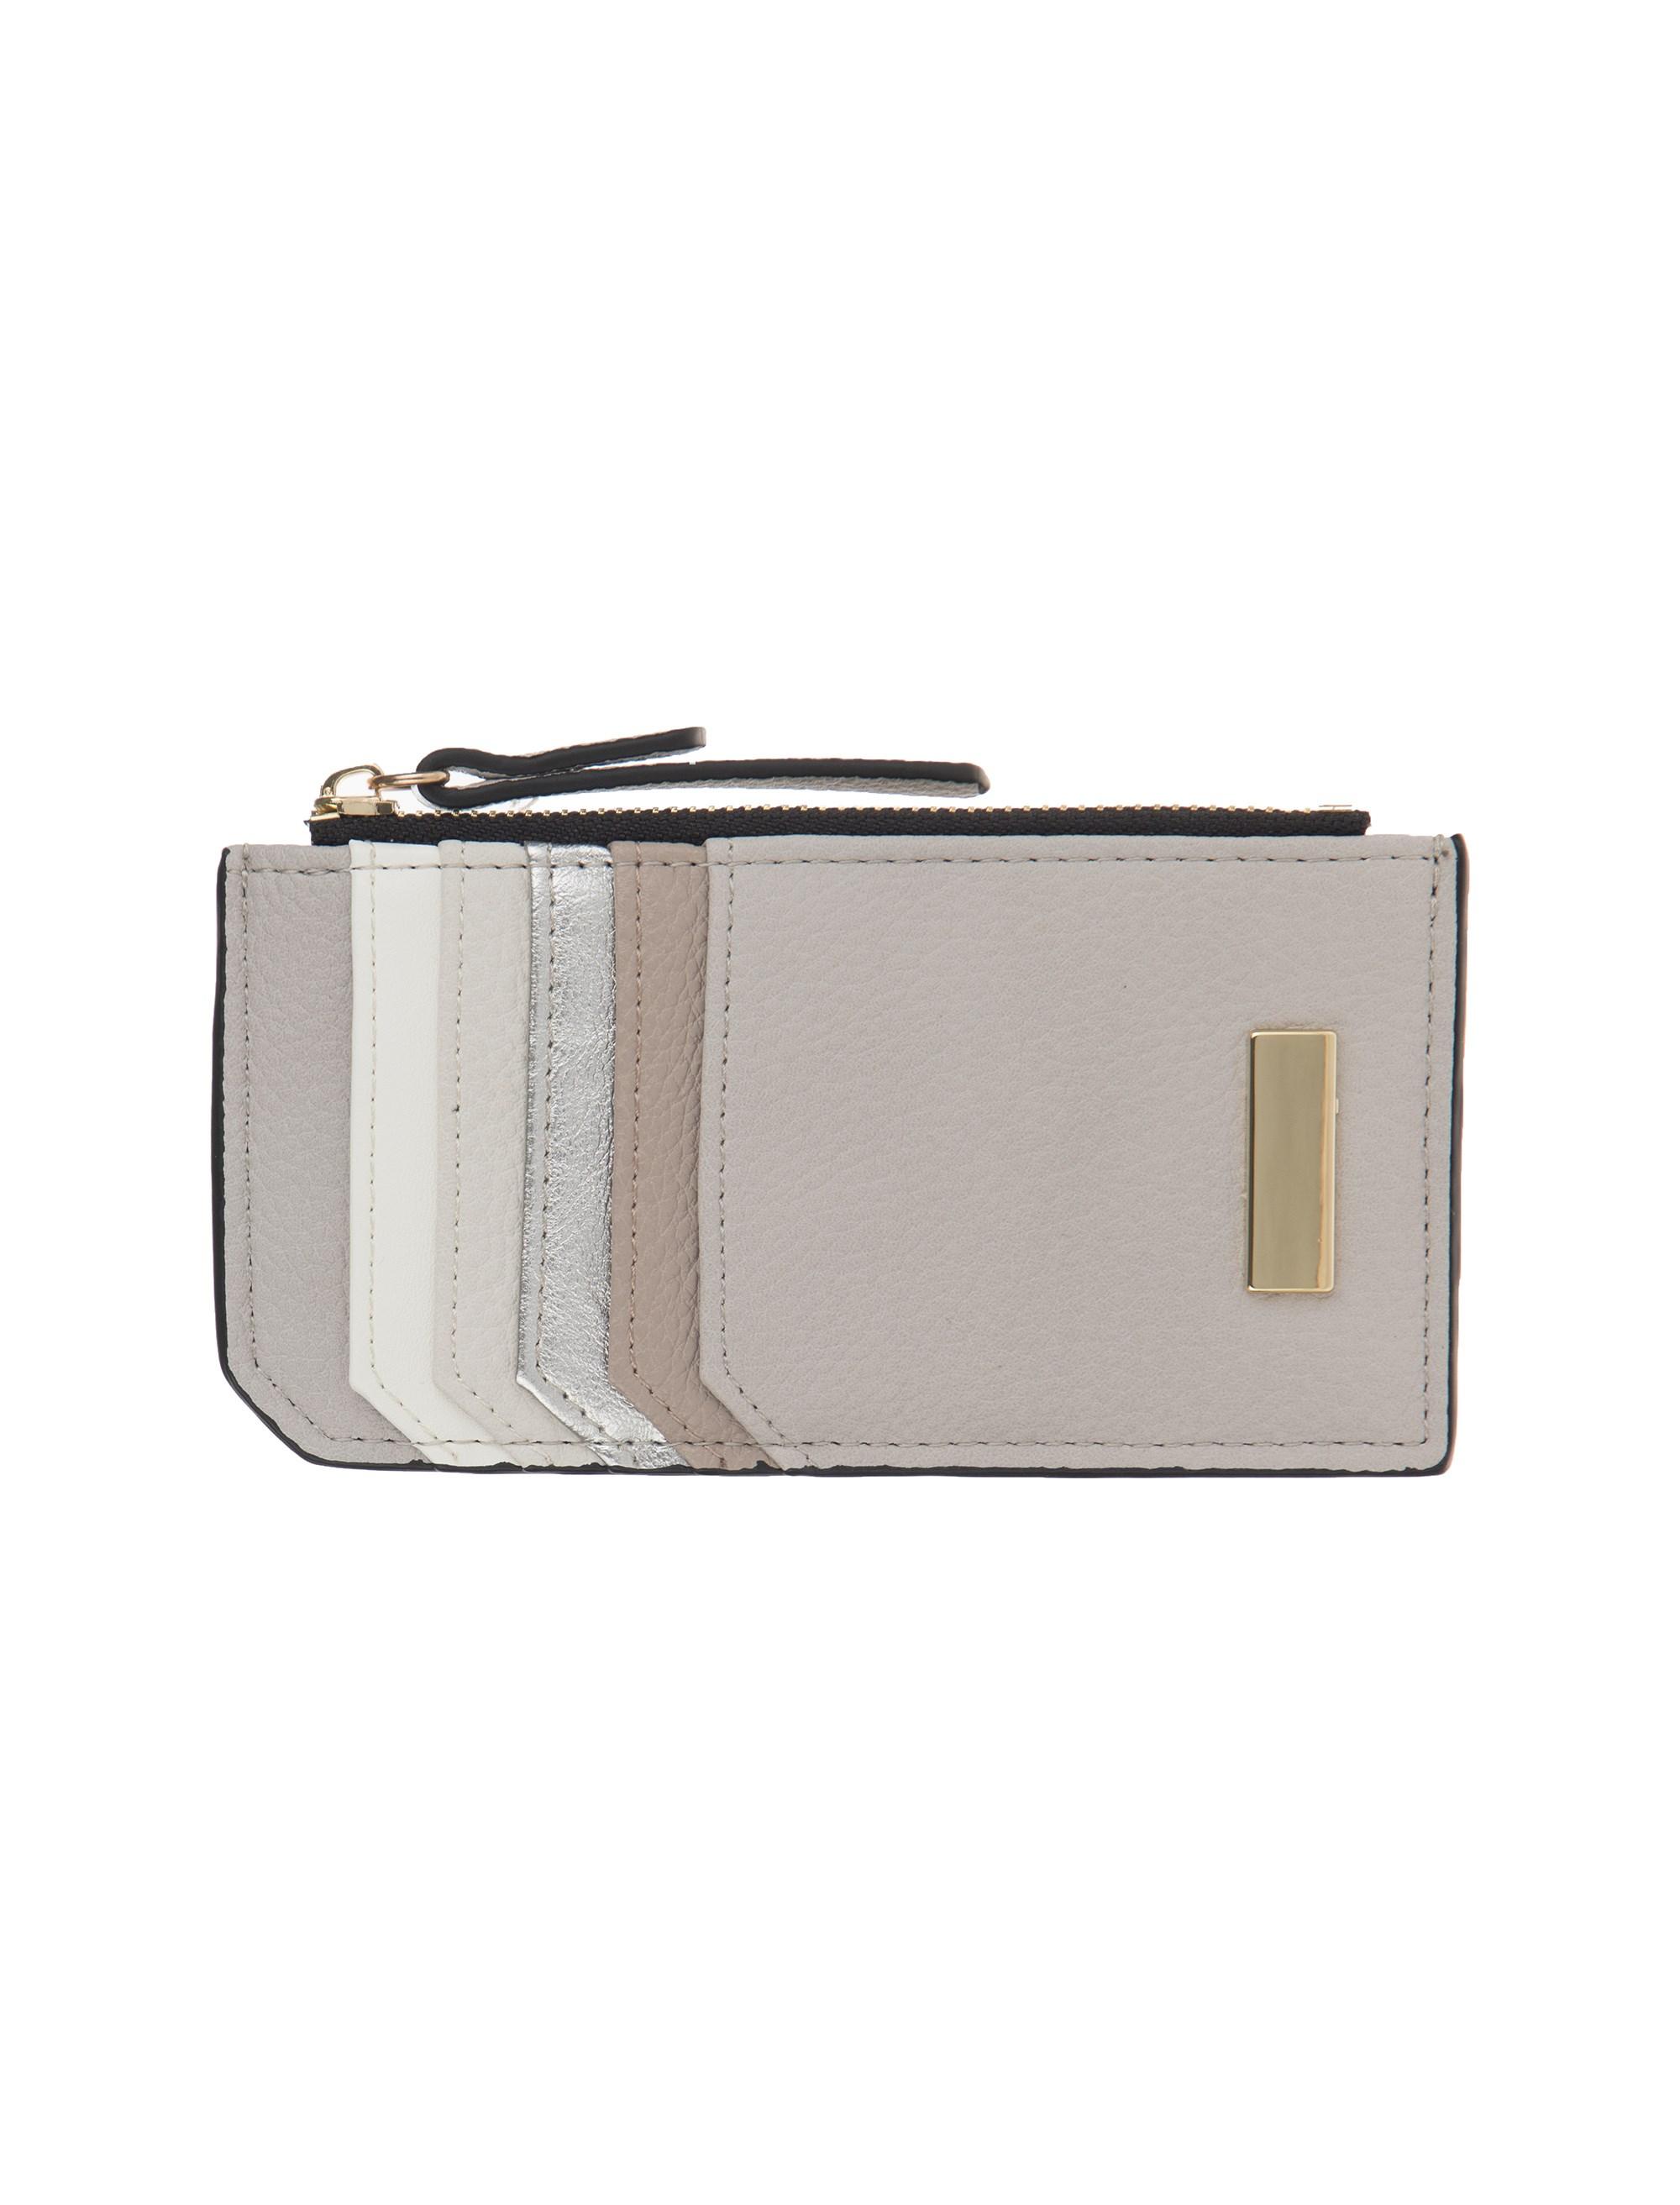 کیف پول زیپ دار زنانه - طوسي روشن - 2